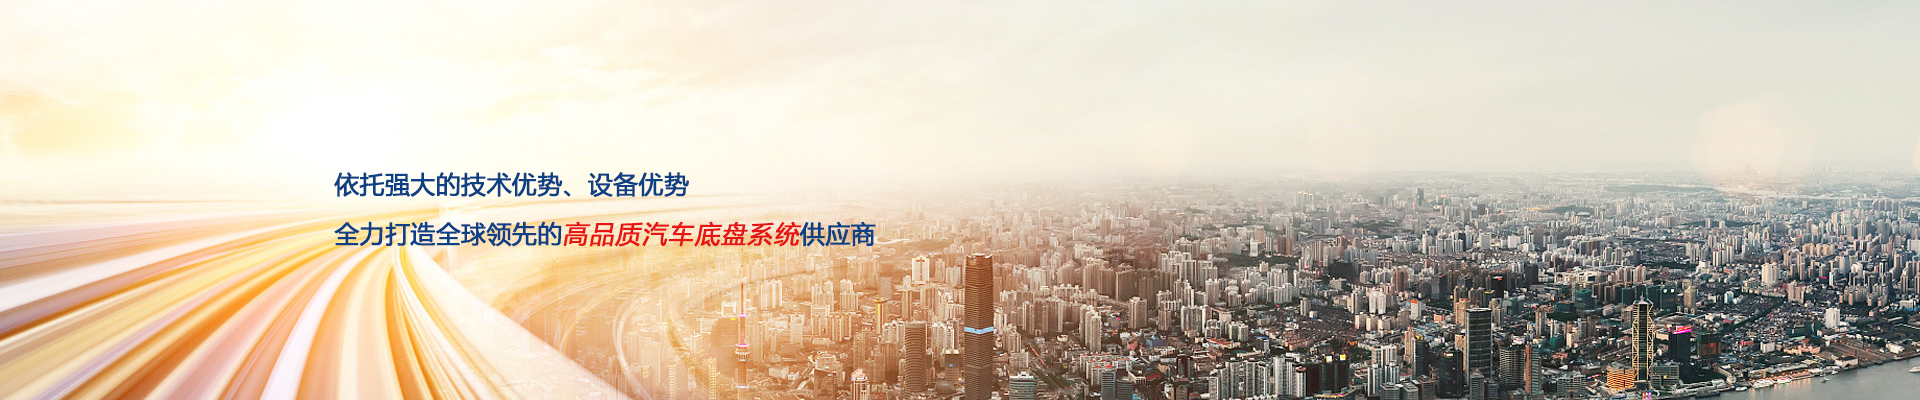 http://www.cnkaifurui.com/data/images/slide/20190819103713_511.jpg